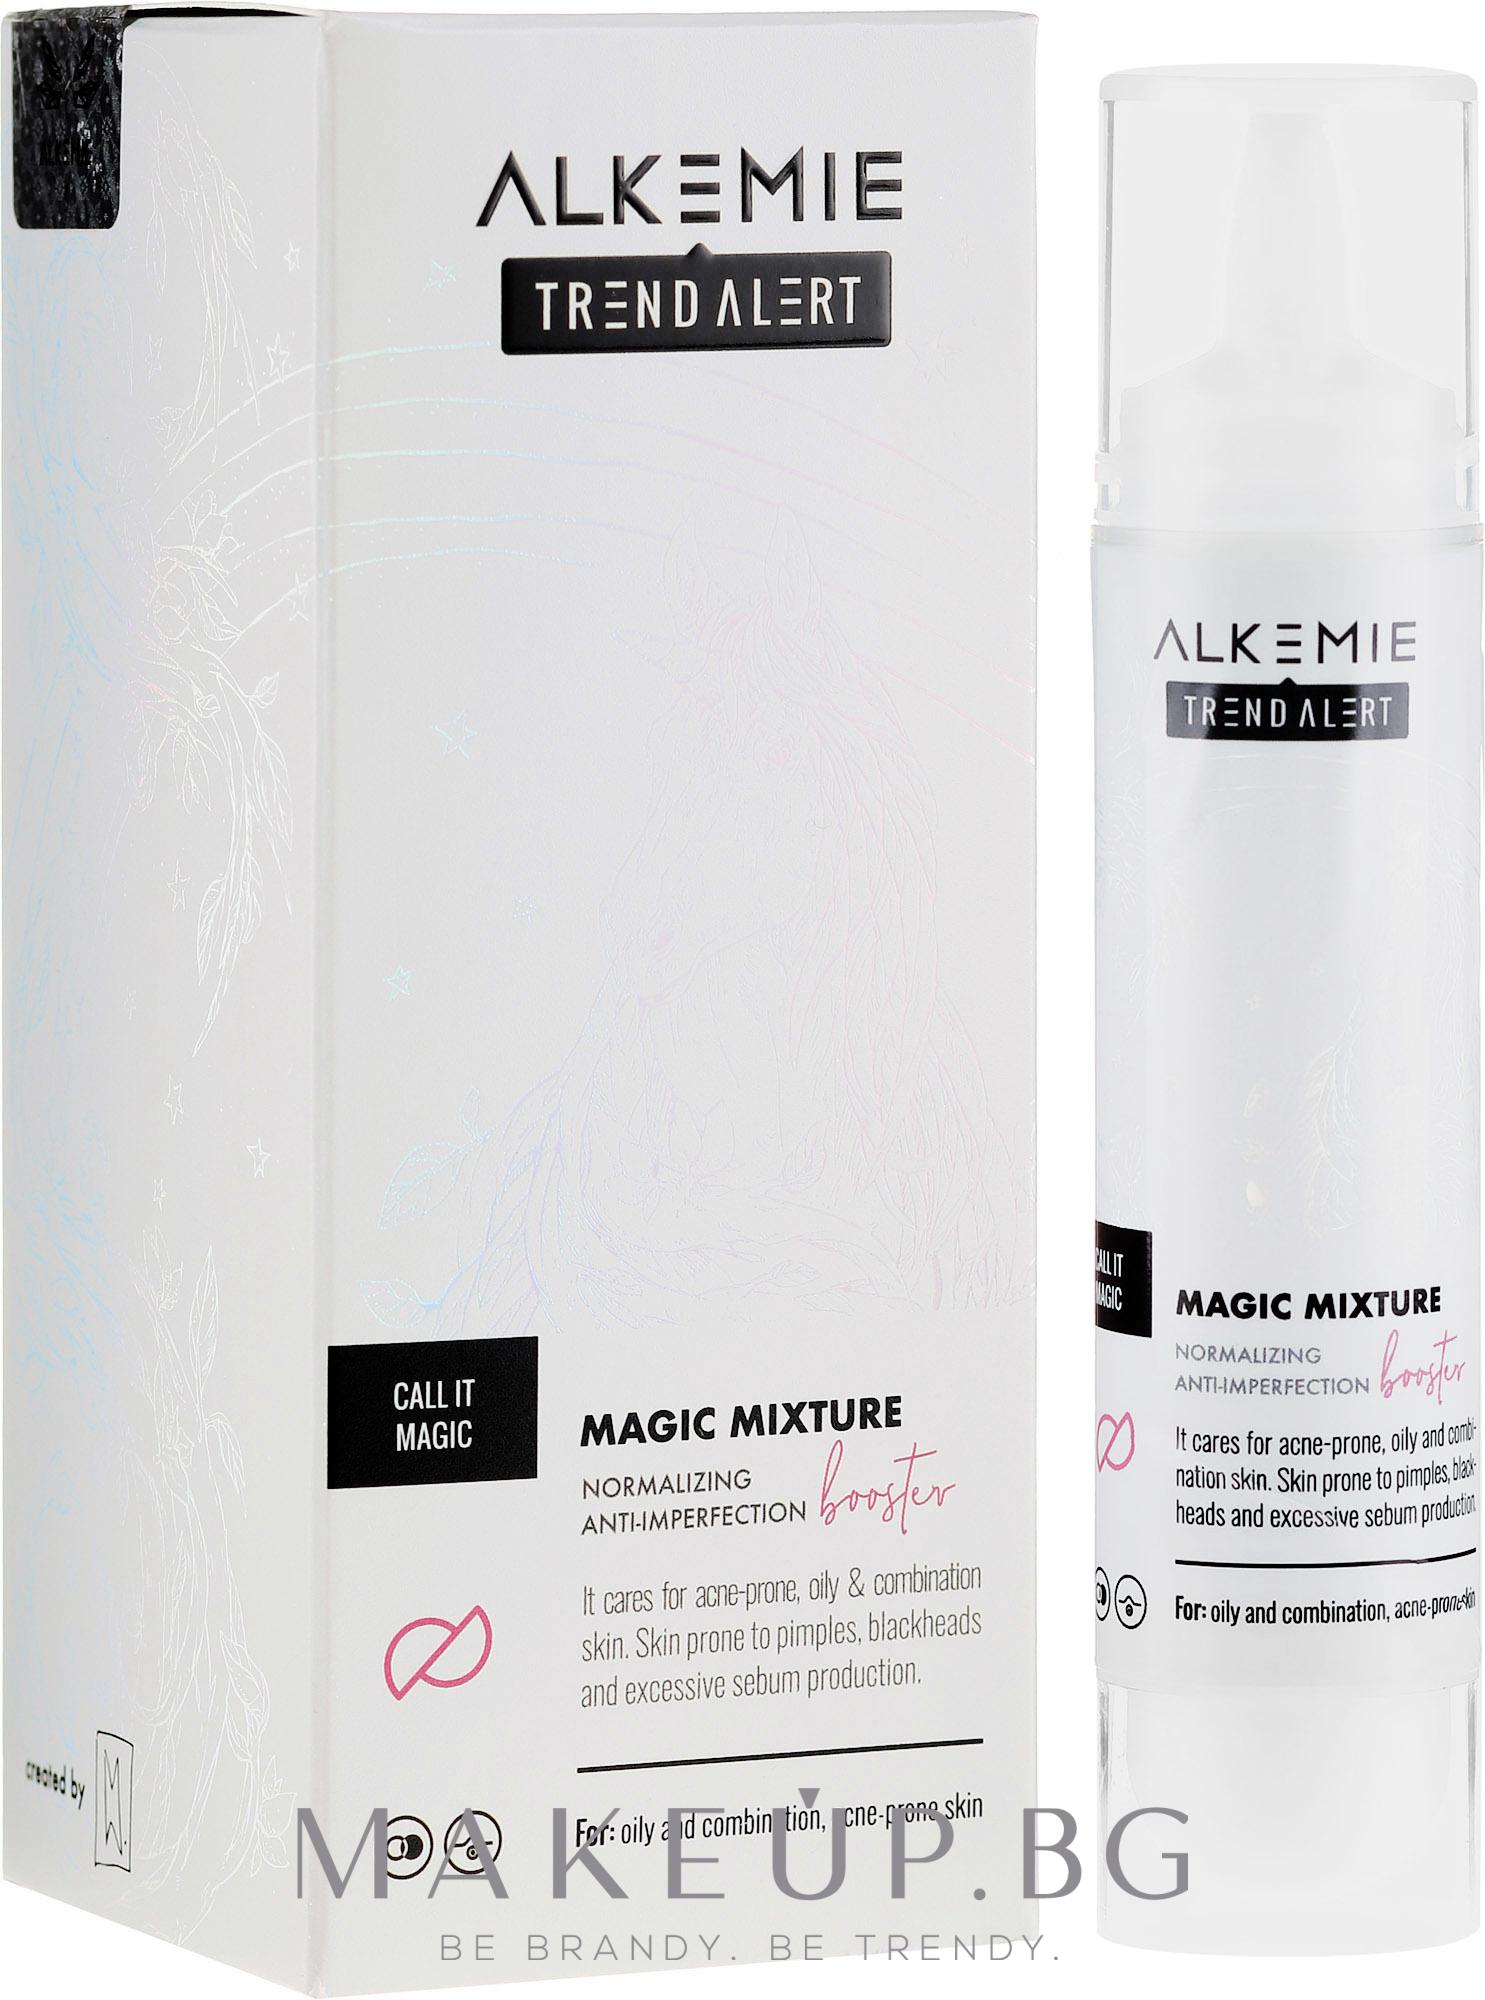 Нормализиращ бустер срещу несъвършенства - Alkemie Call it Magic Normalizing Anti-Imperfection Booster — снимка 30 ml